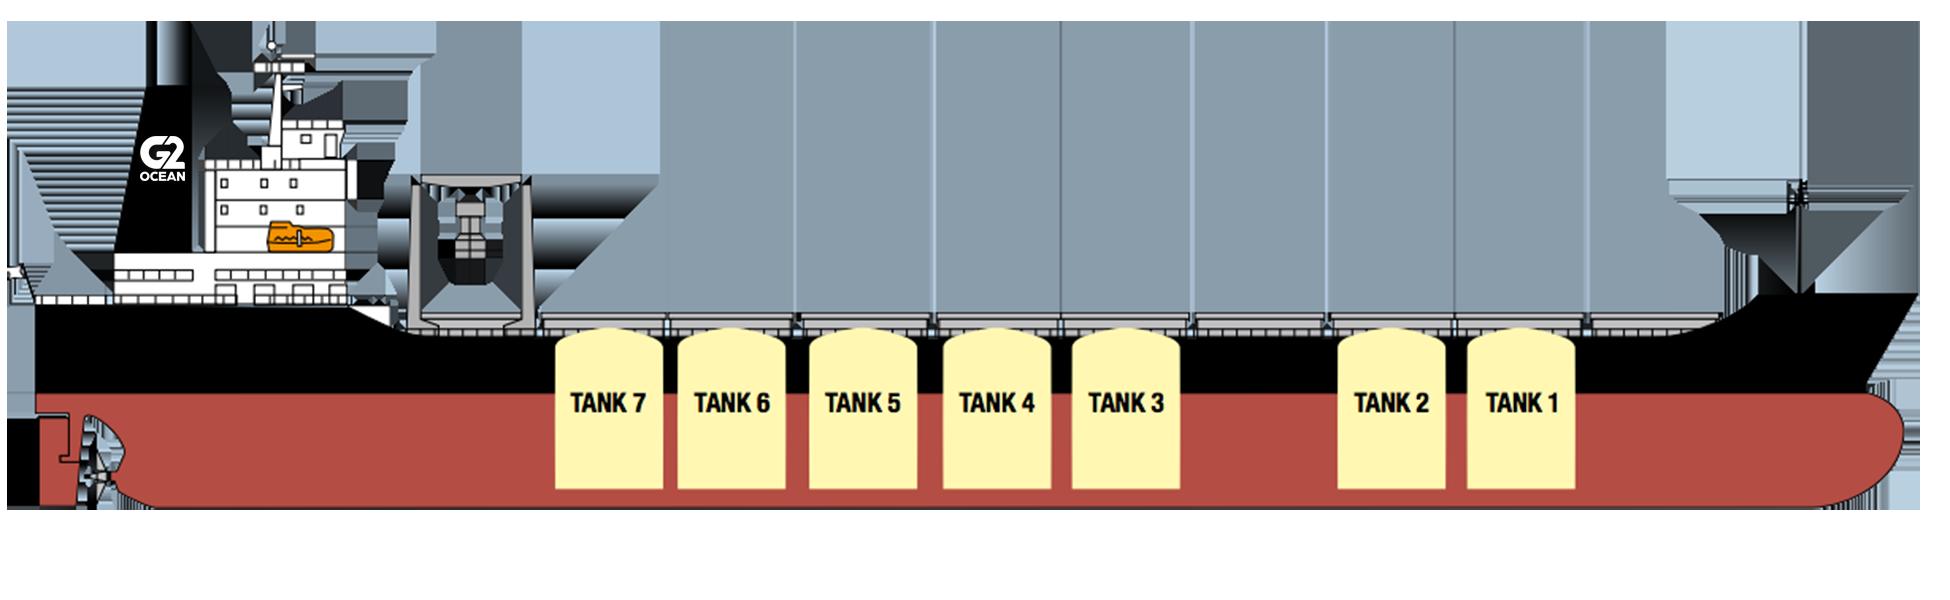 4th Generation Juice Combination Class